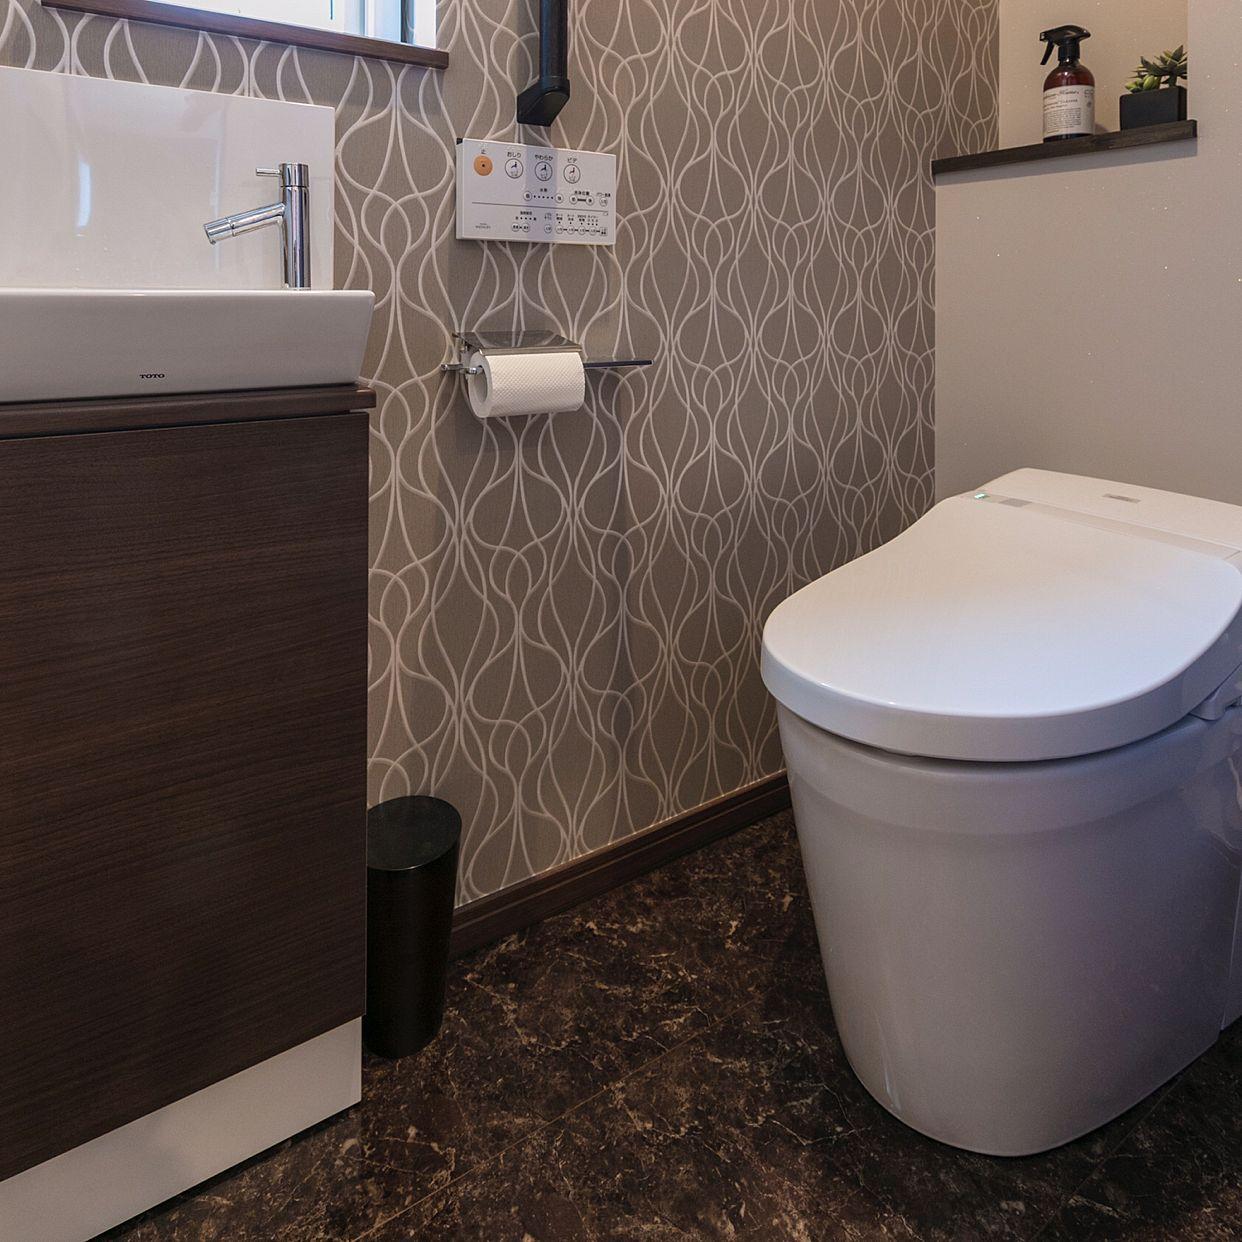 TOTOトイレ/うちの壁紙はこれ!/壁紙/アクセントクロス/サンゲツ壁紙のインテリア実例 - 2017-09-24 18:16:57 |  RoomClip(ルームクリップ) | トイレ アクセントクロス, サンゲツ 壁紙, トイレ 壁紙